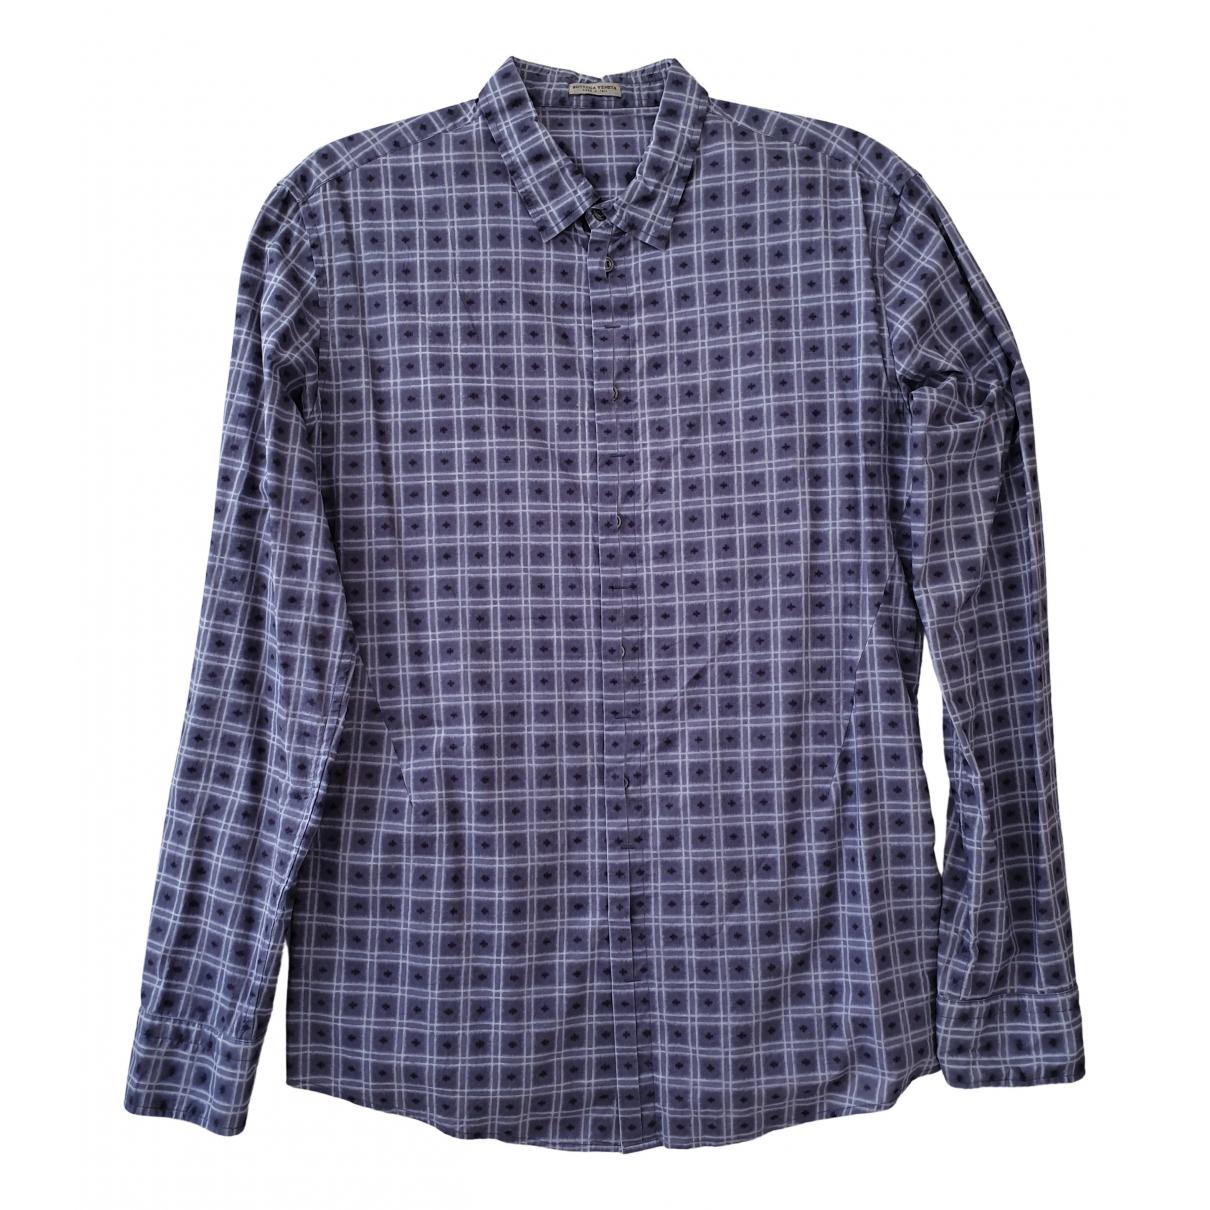 Bottega Veneta \N Blue Cotton Shirts for Men M International